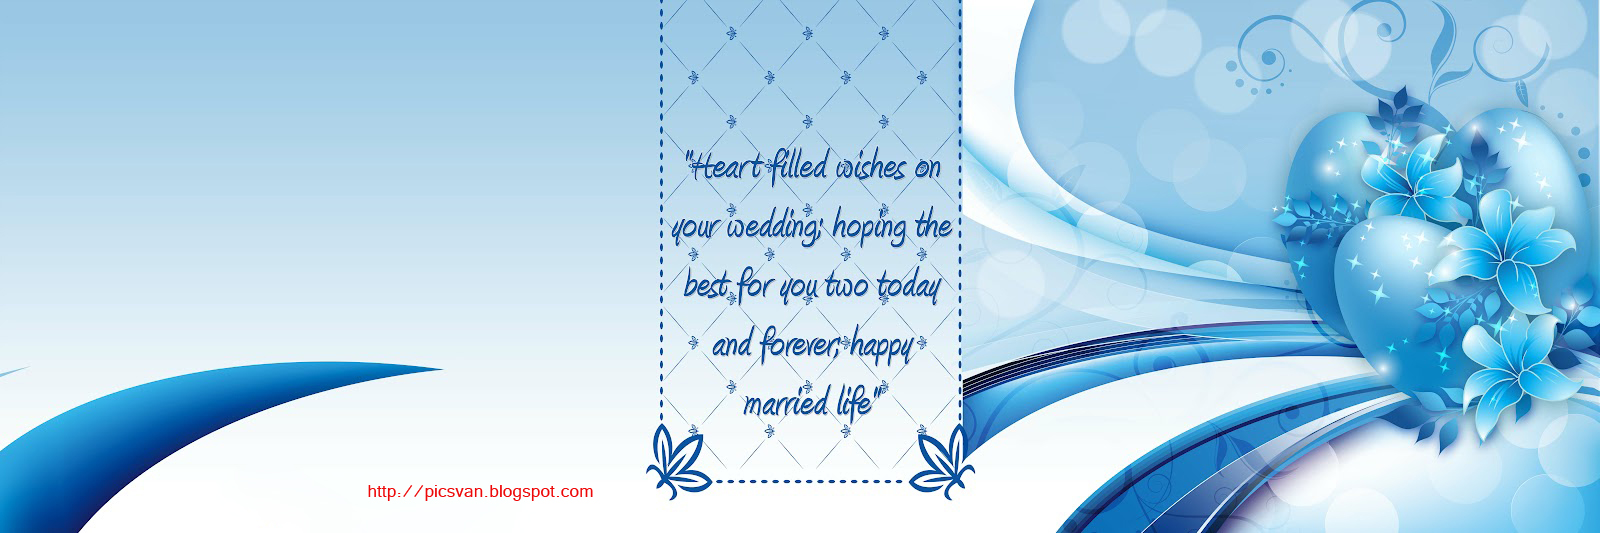 Blue wedding background design hd clipartsgram com - Jpg 1600x533 Royal Blue Wedding Backgrounds